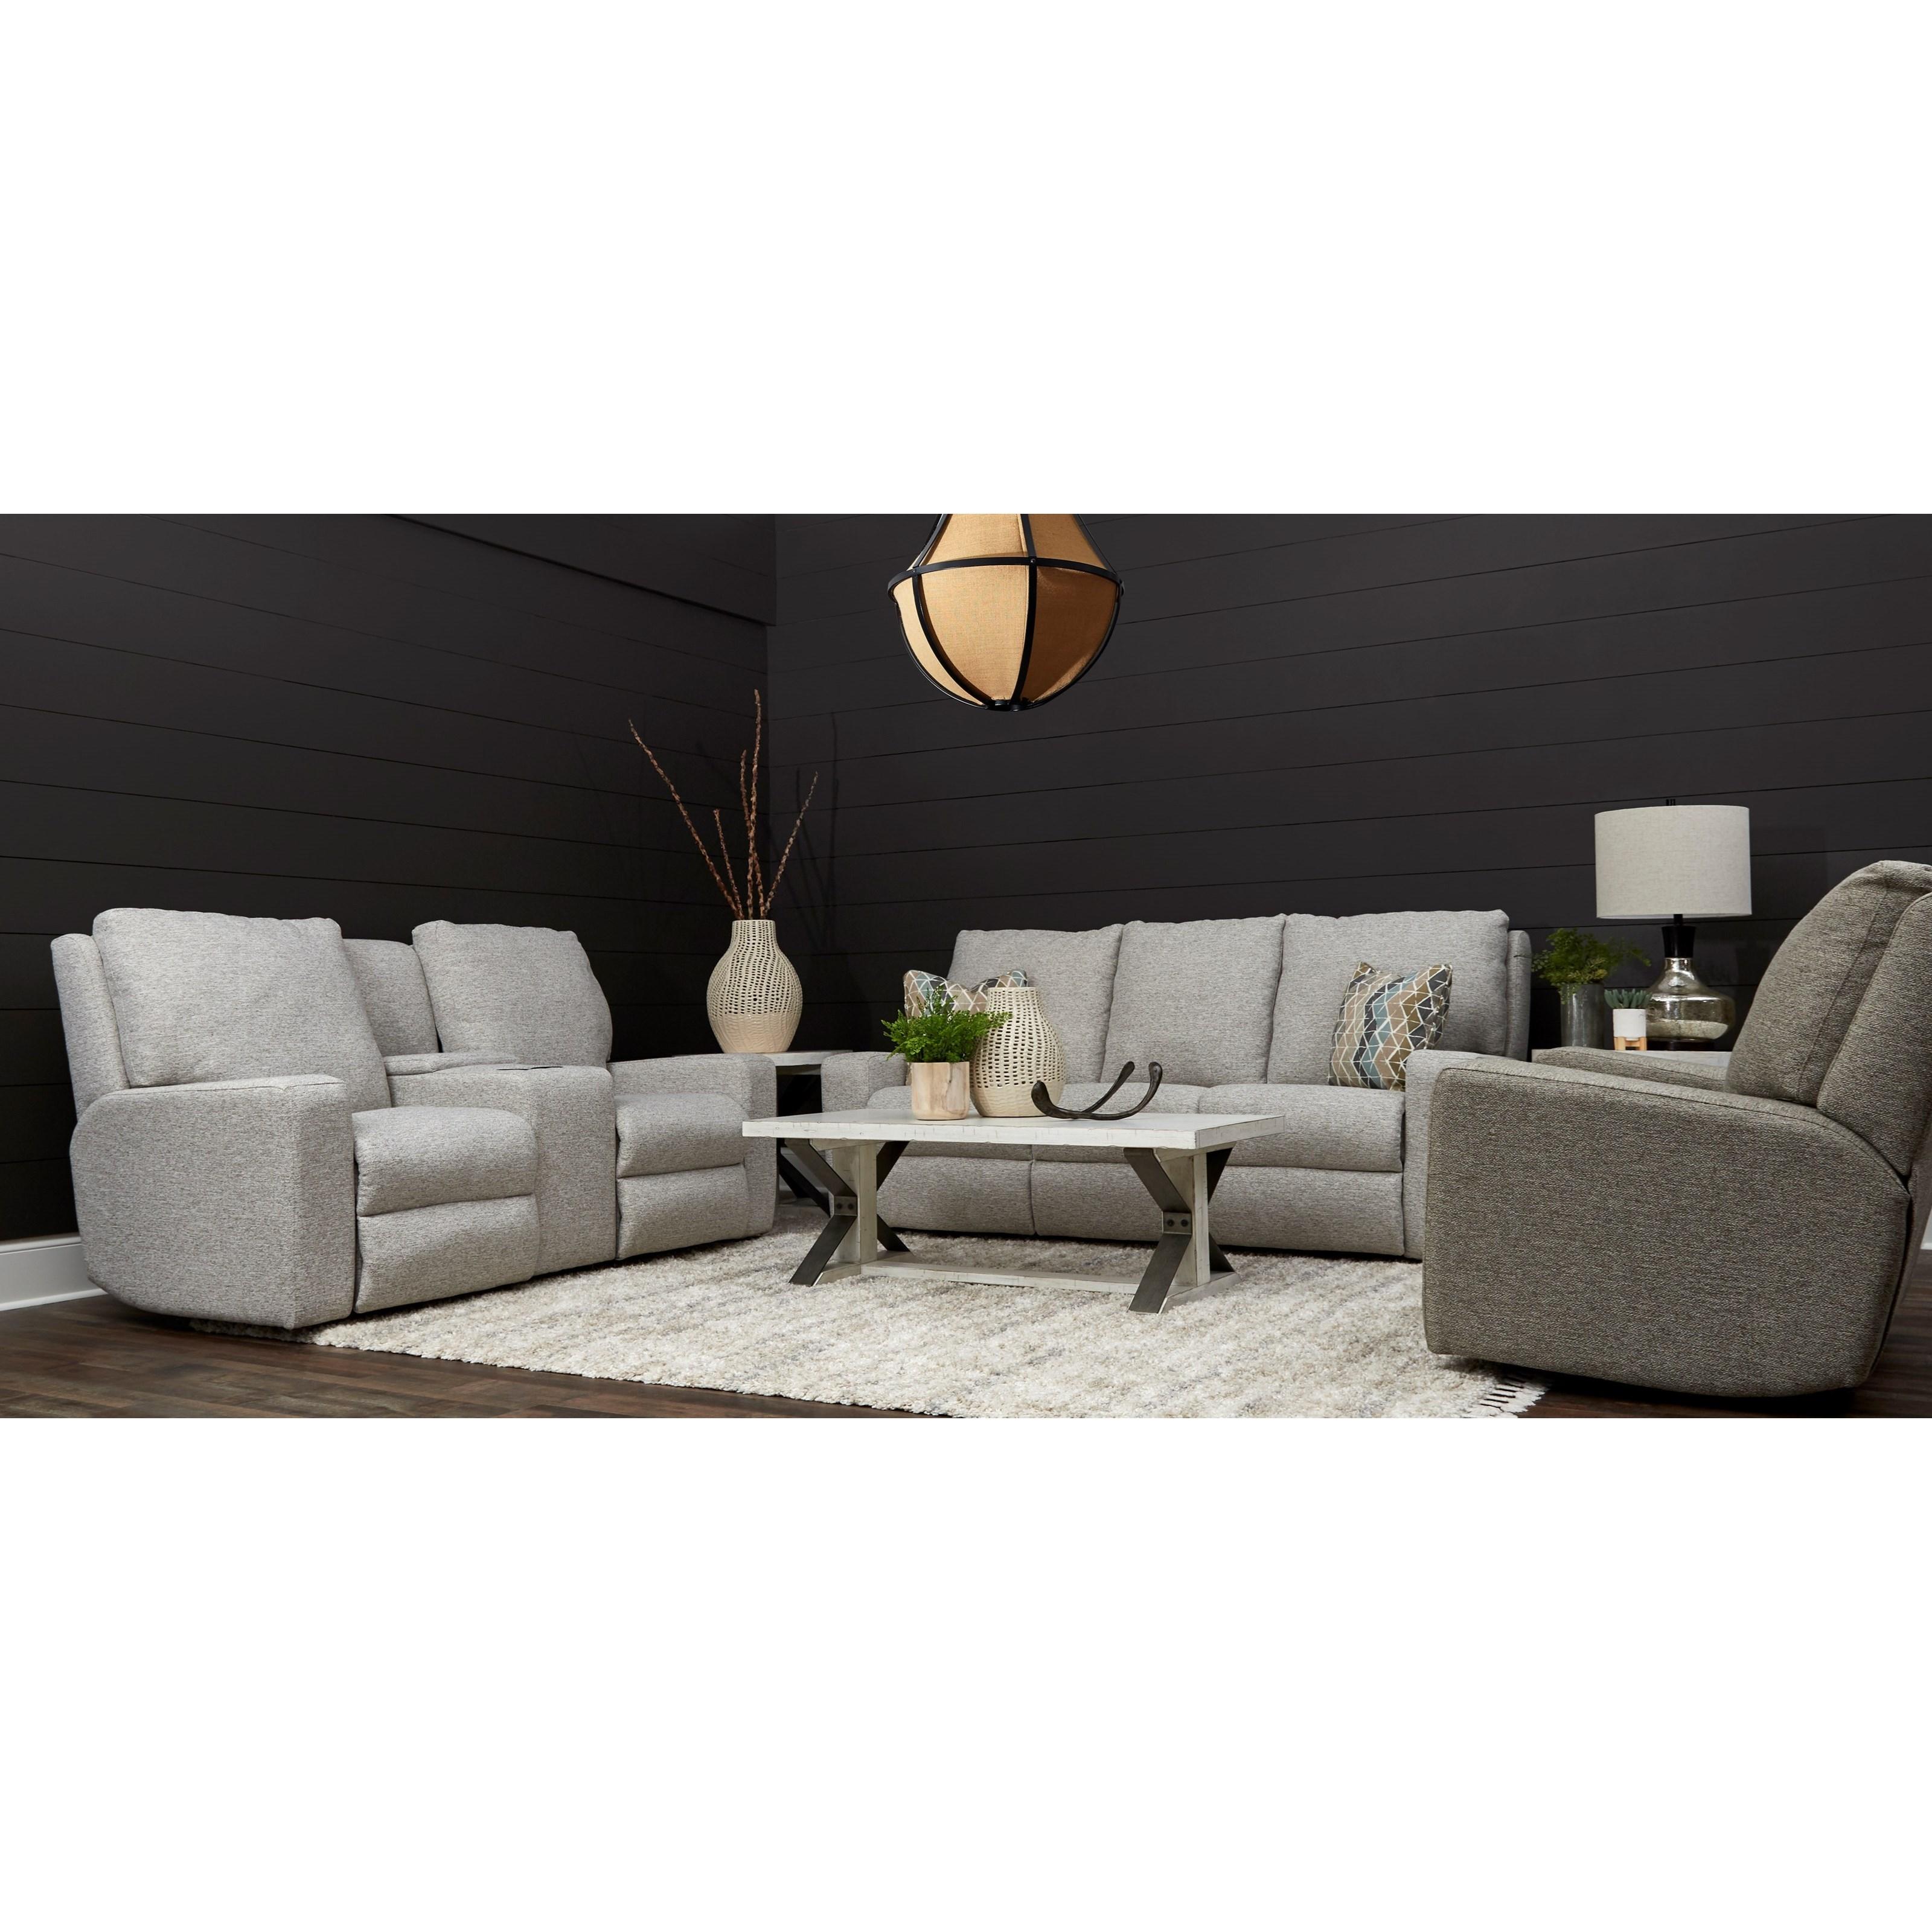 Alliser Power Reclining Living Room Group by Klaussner at Lapeer Furniture & Mattress Center